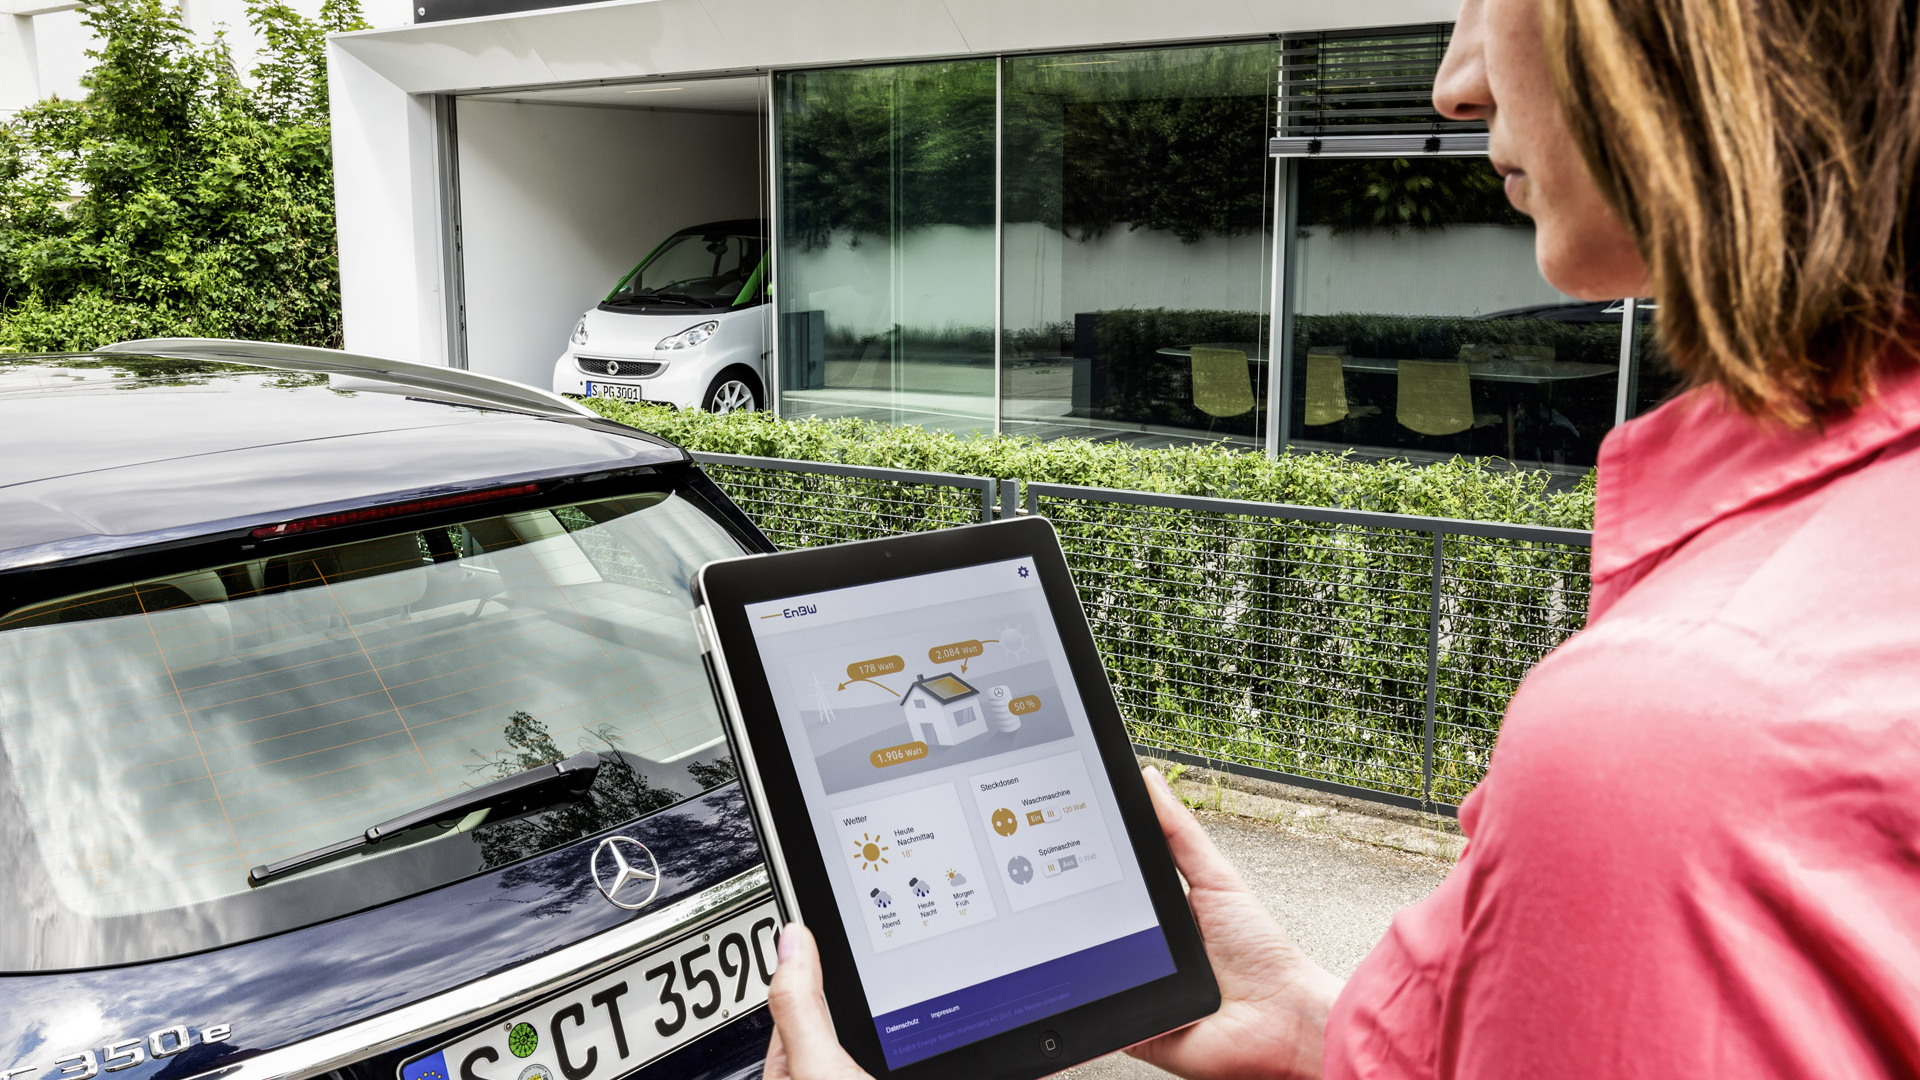 Mercedes-Benz energy storage system